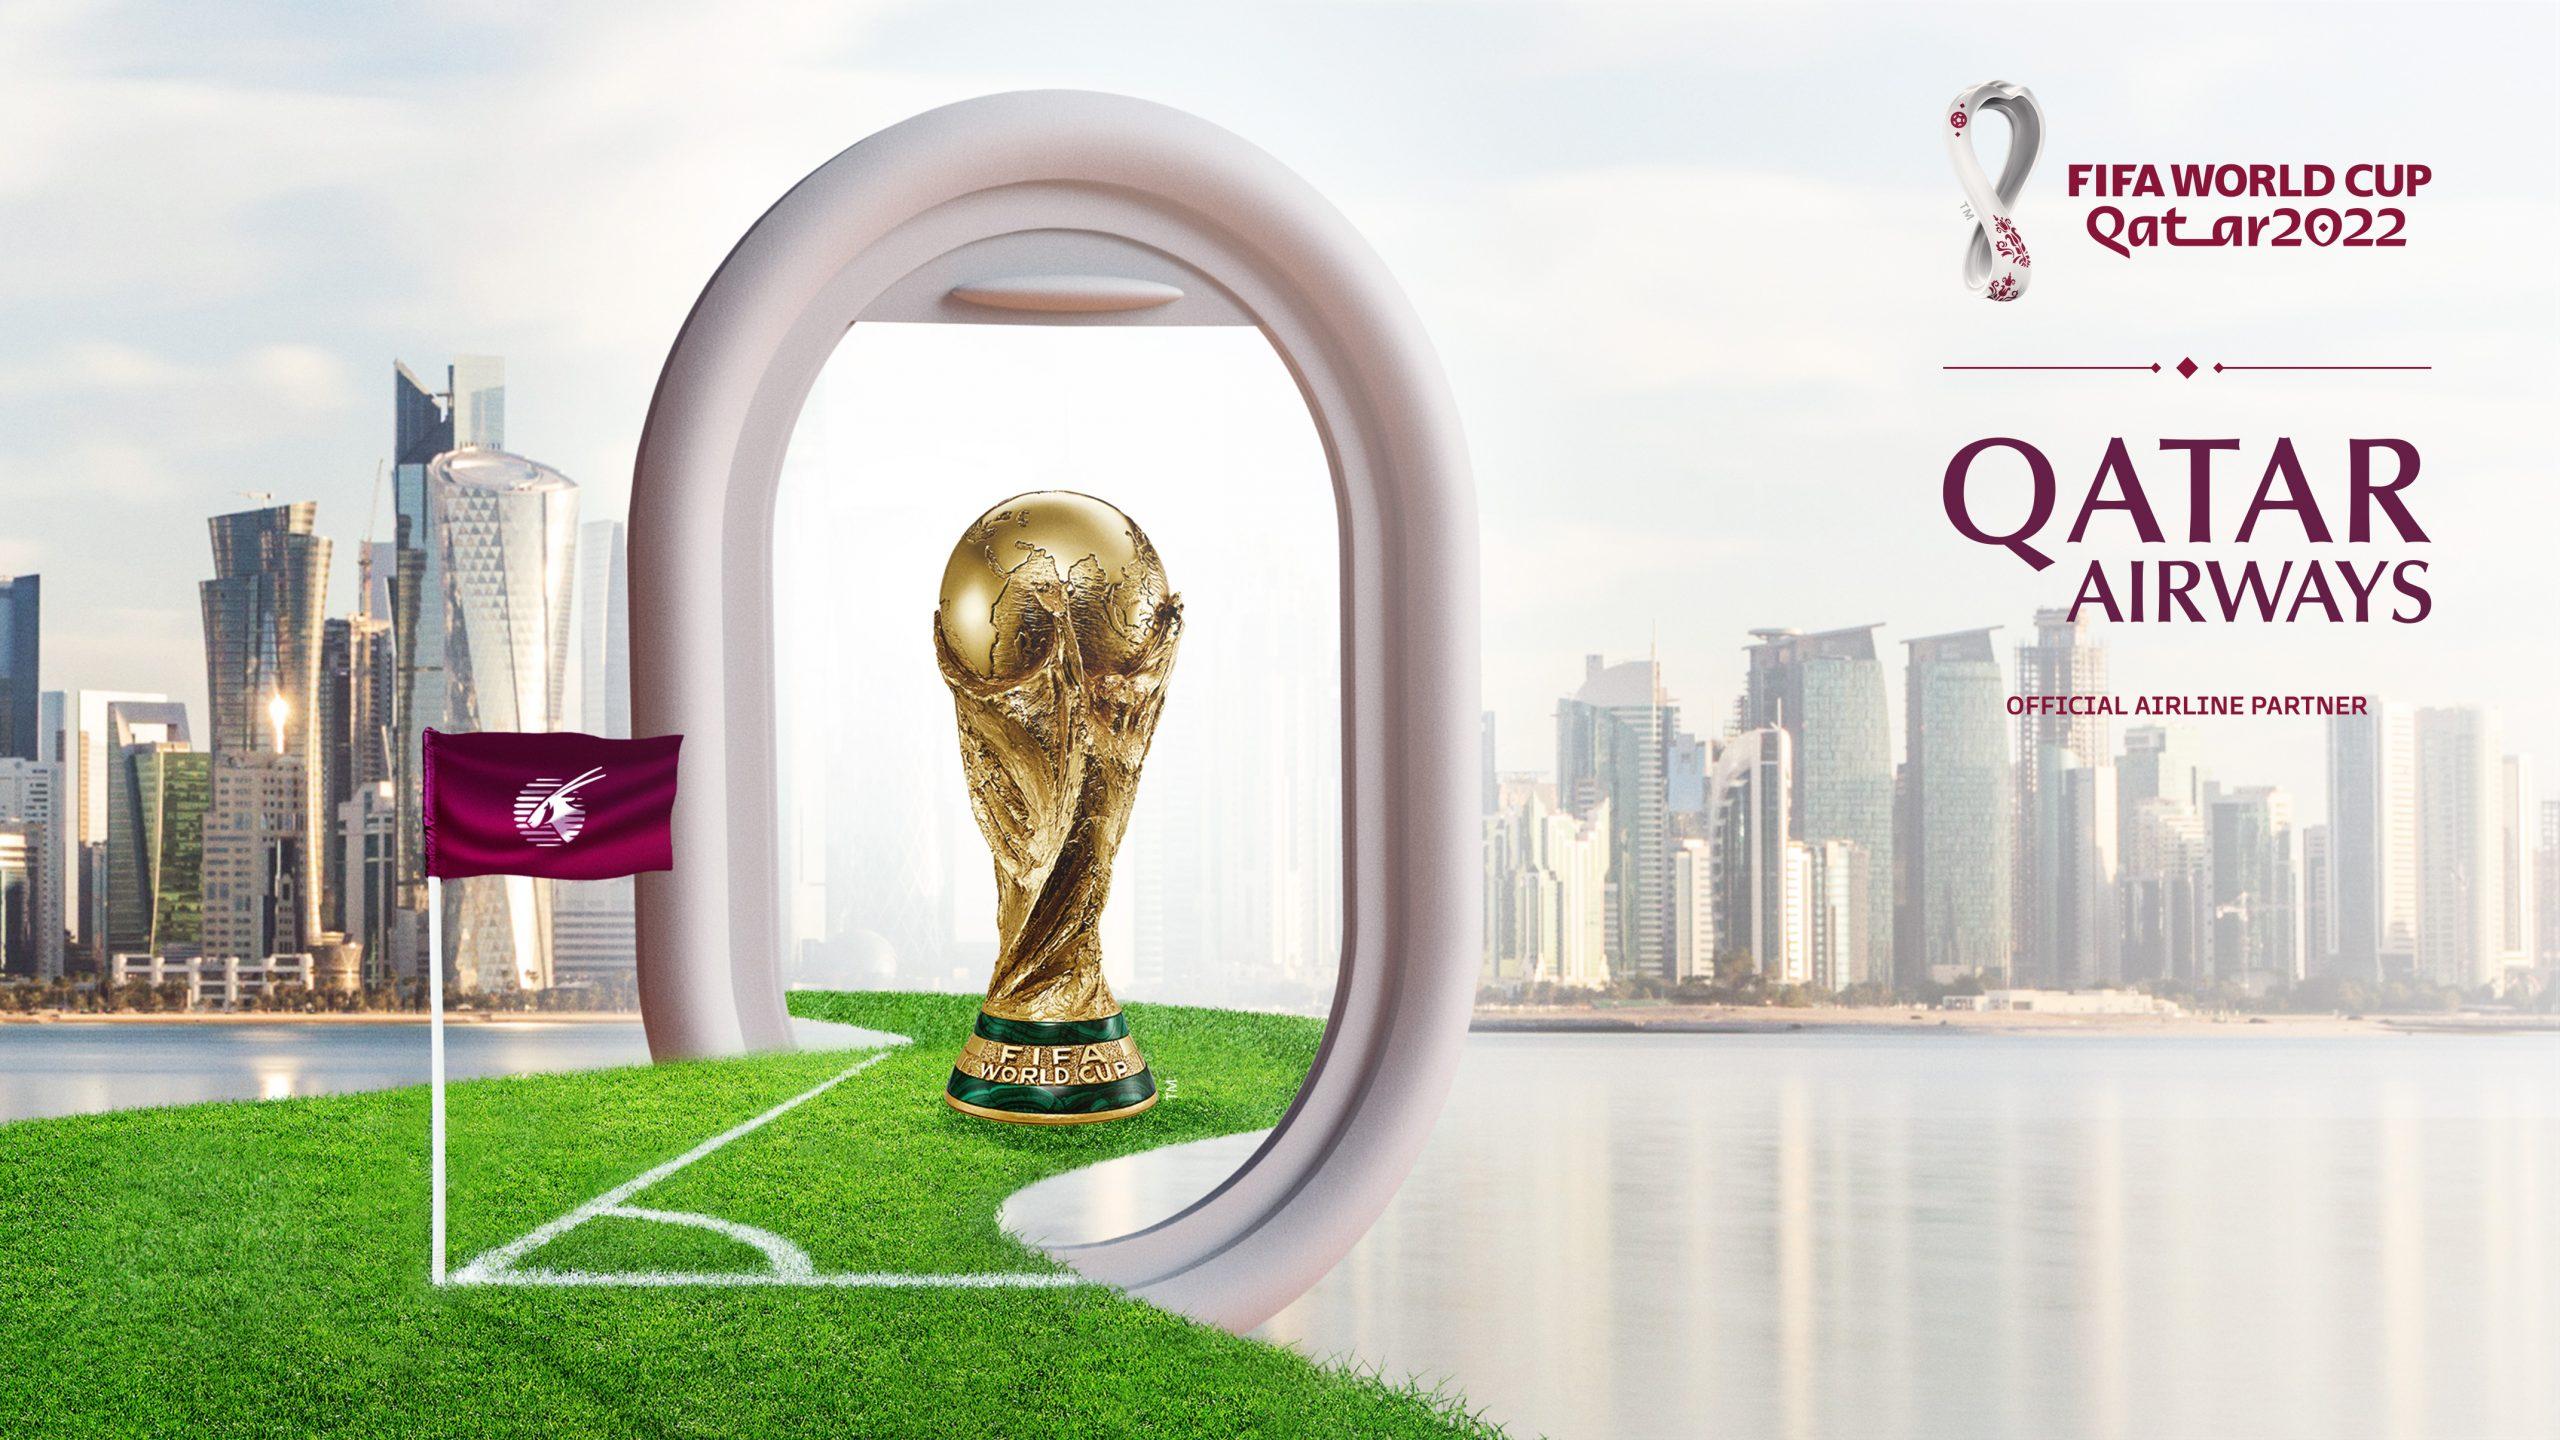 Qatar Airways Holidays launch Qatar 2022 World Cup fan travel packages